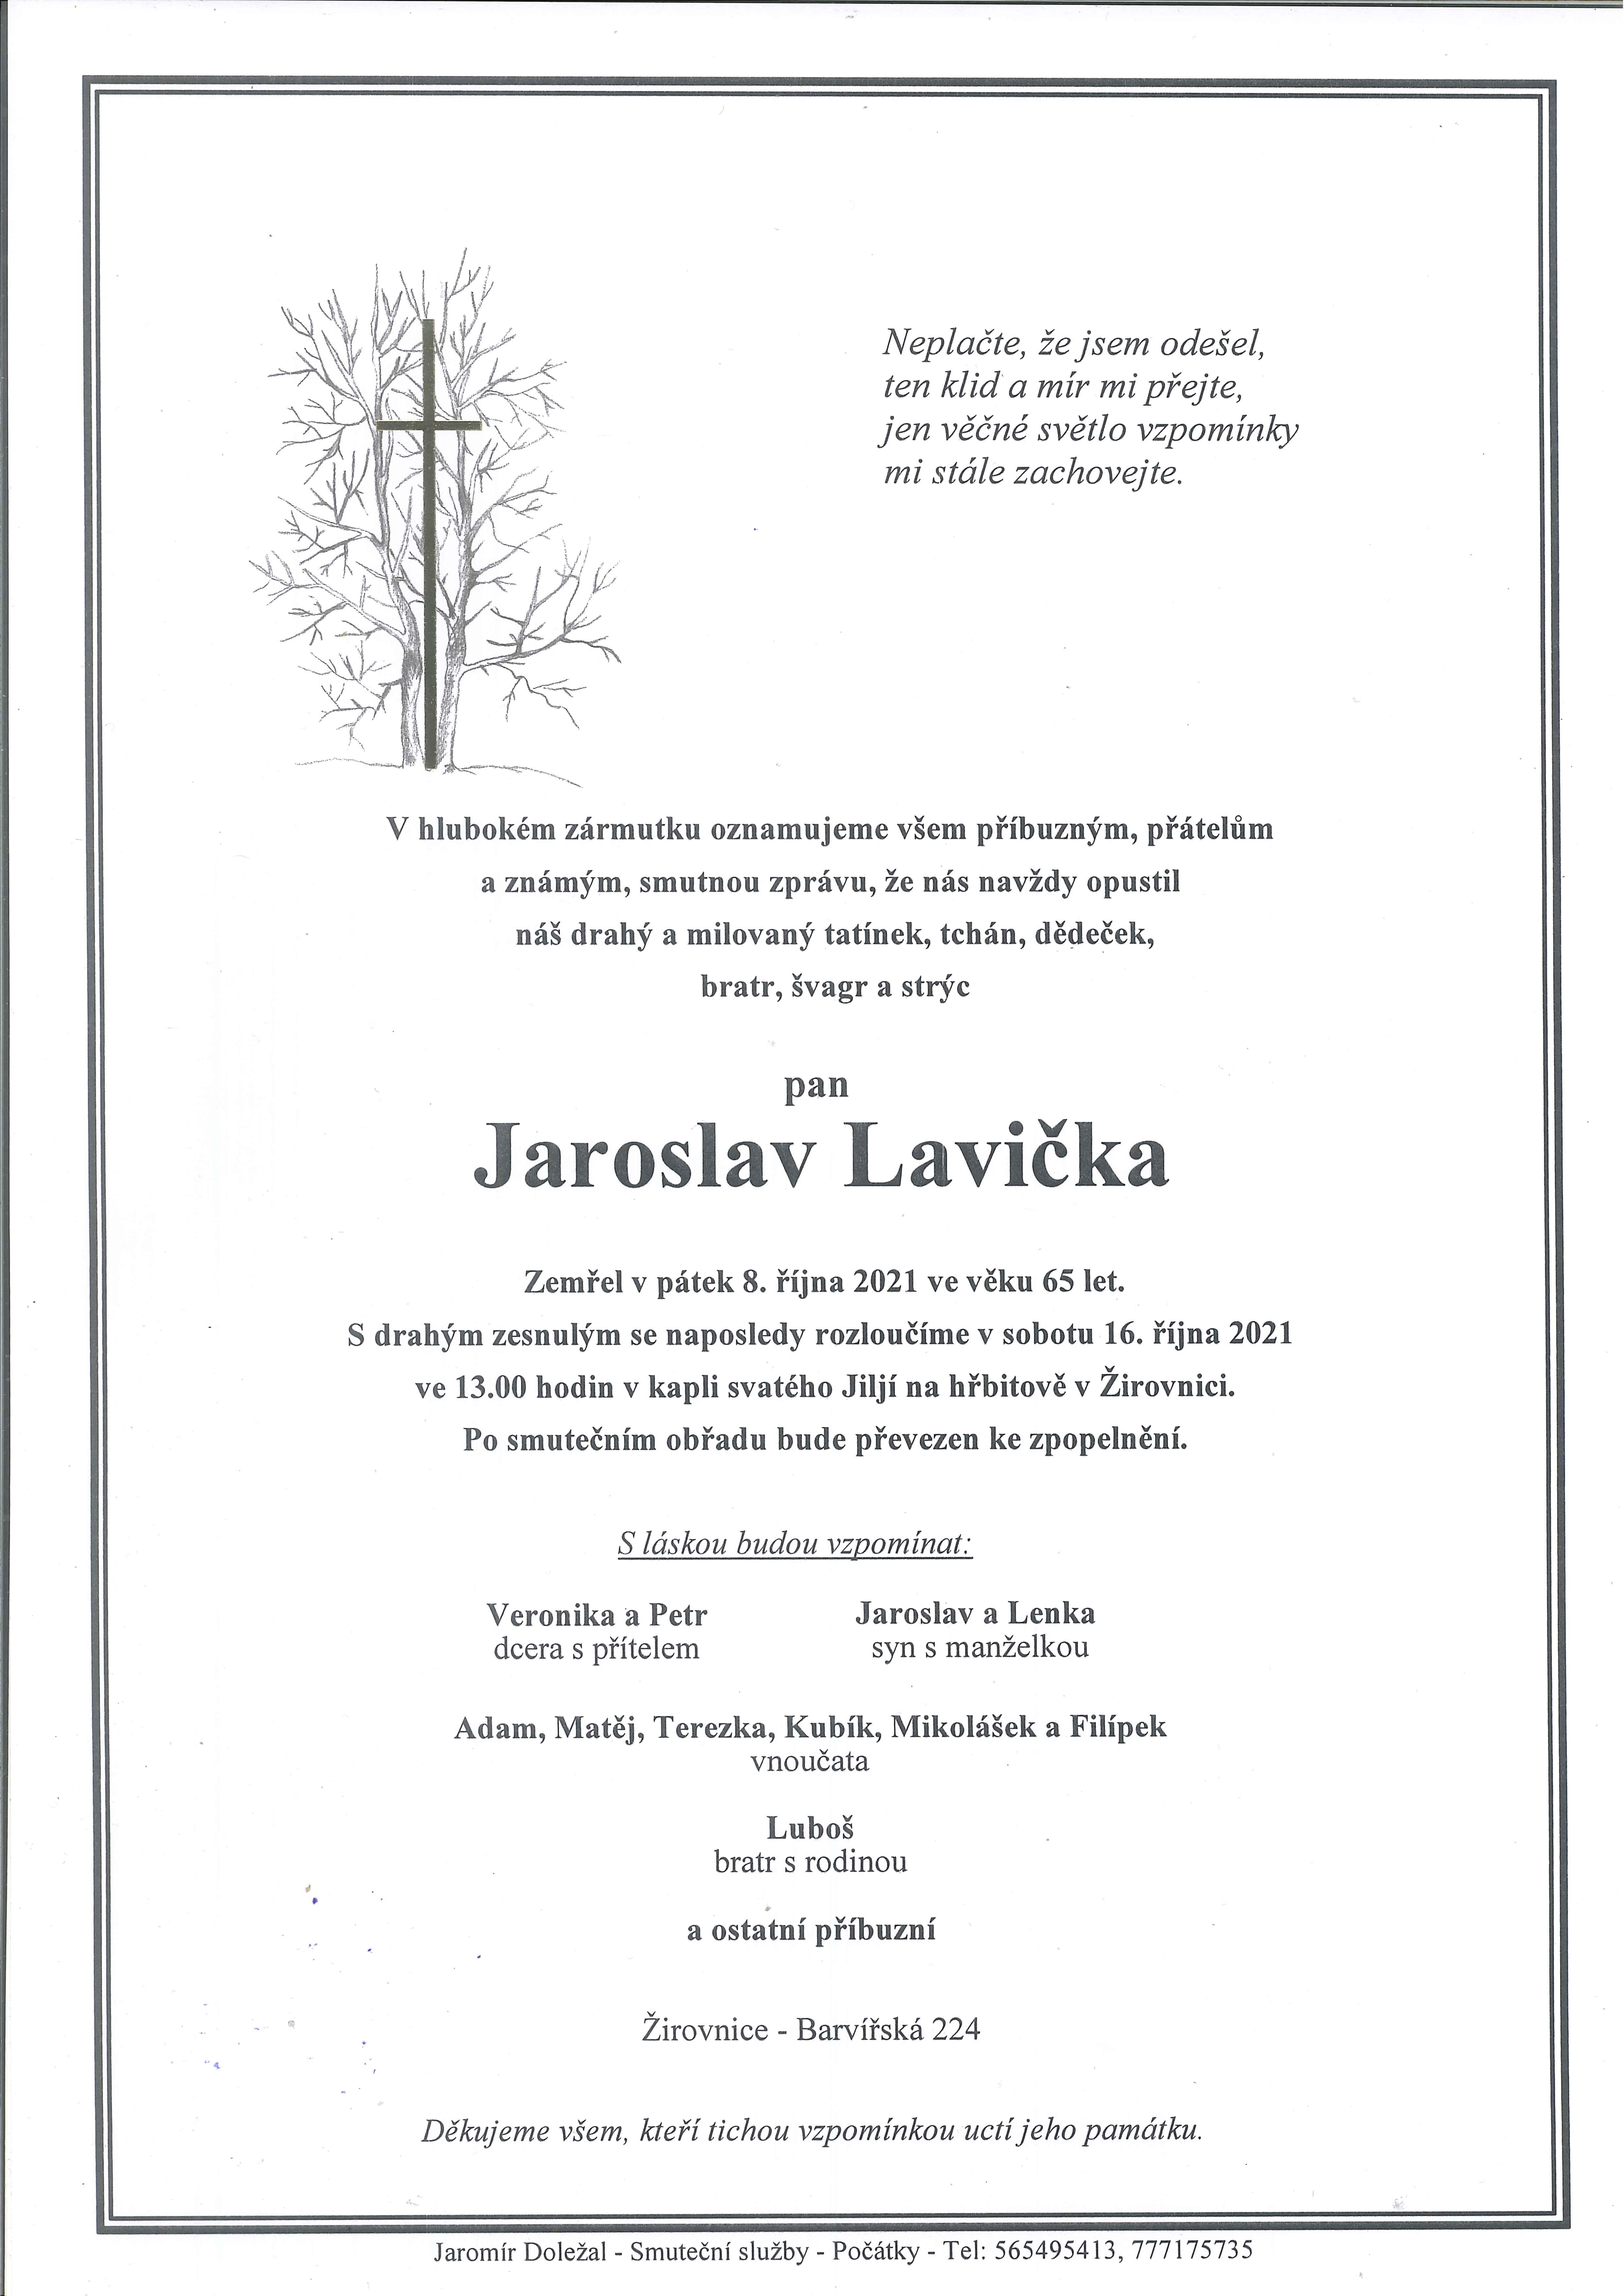 Jaroslav Lavička